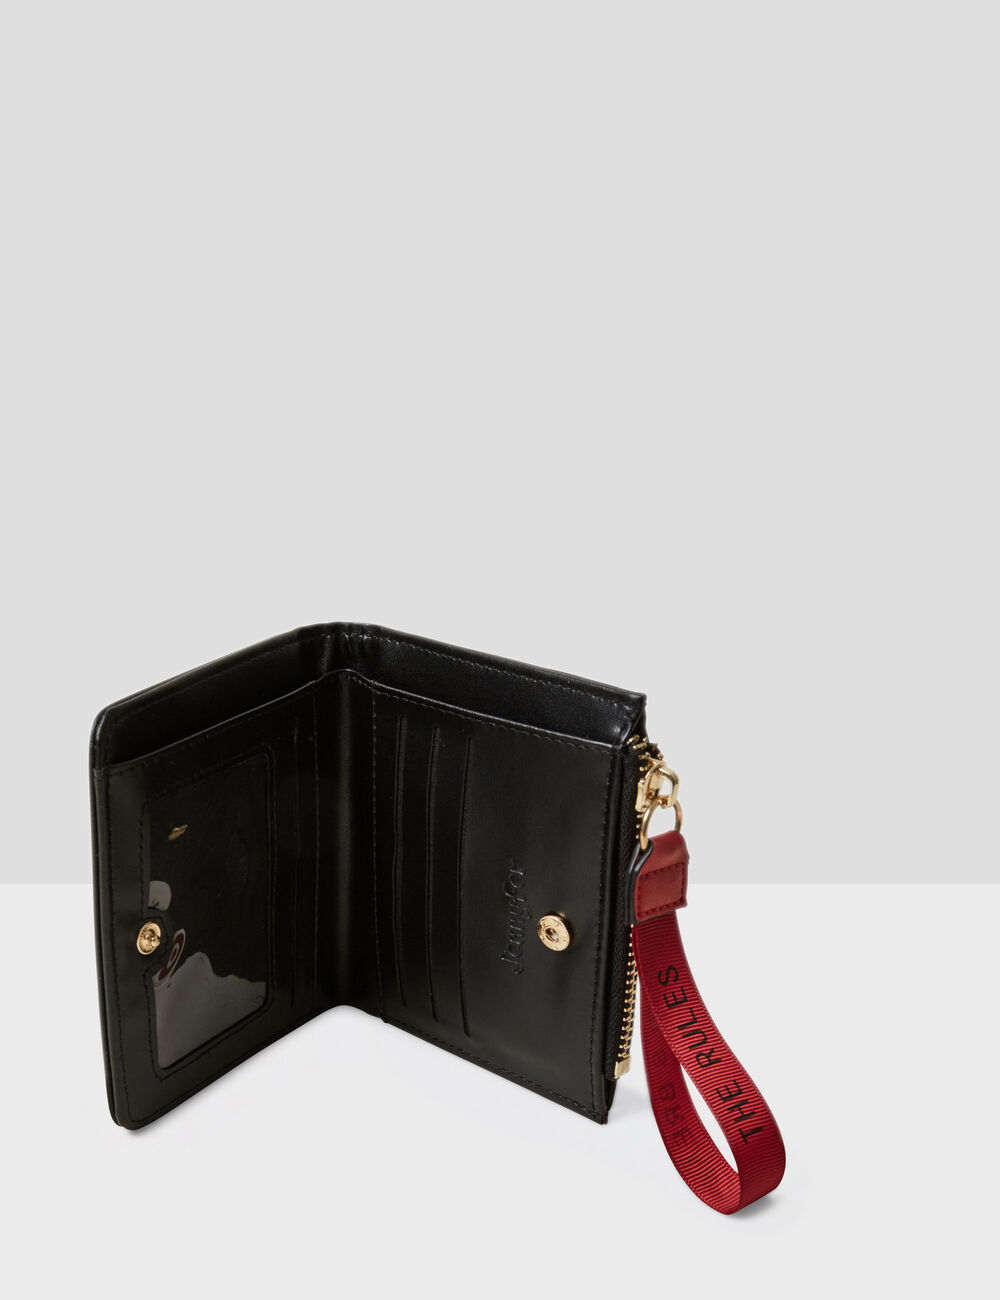 Petit portefeuille noir femme • Jennyfer 9f4f40fcca4